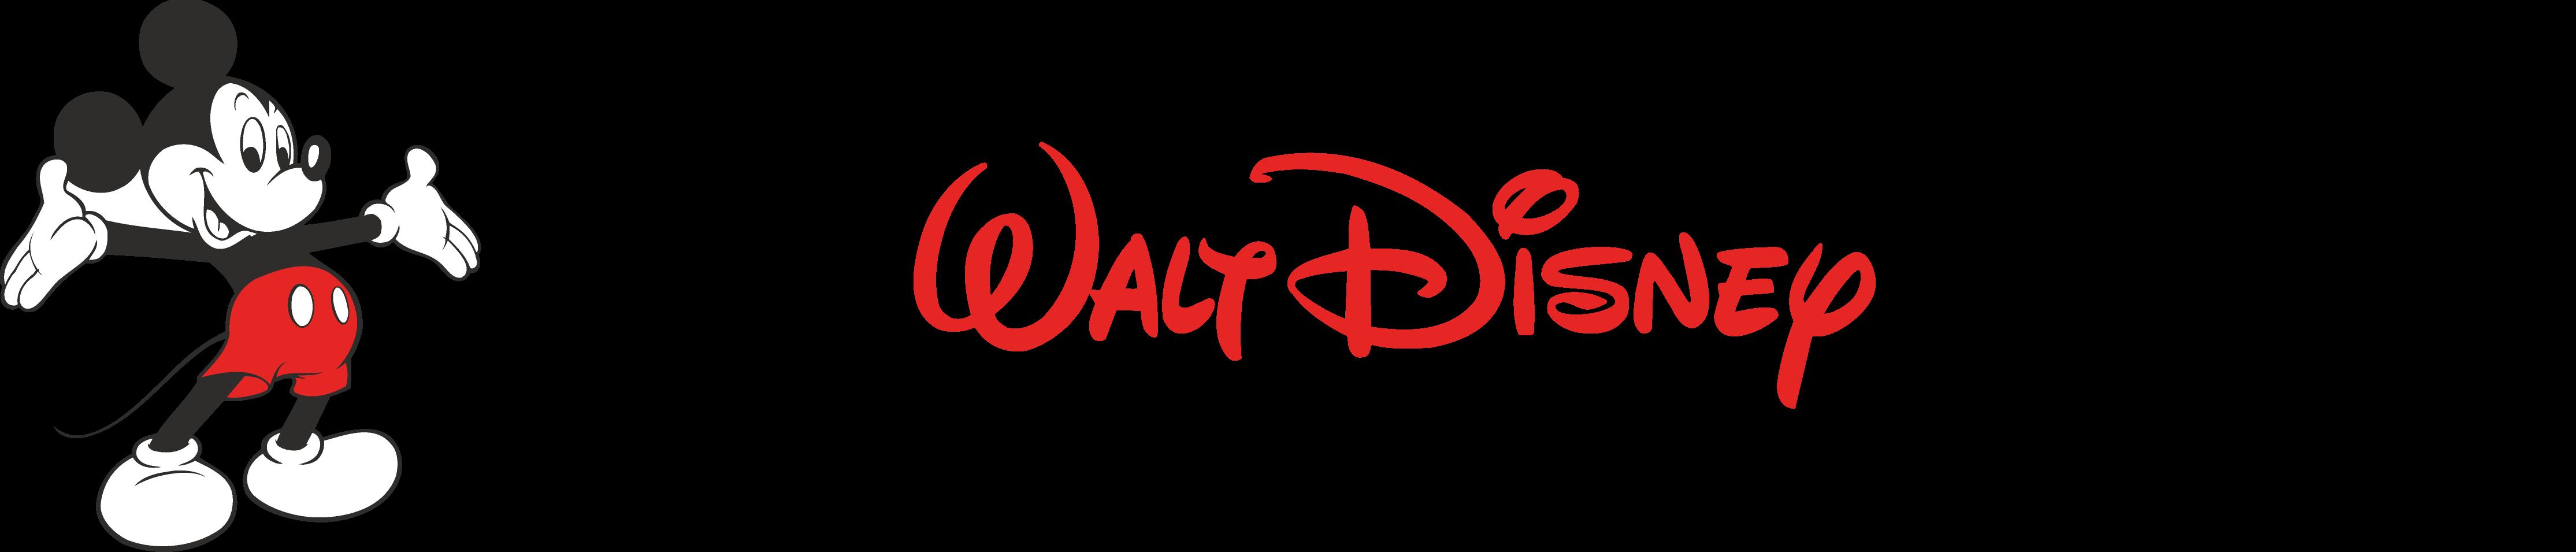 The walt disney company logos pinterest walt disney company the walt disney company biocorpaavc Choice Image